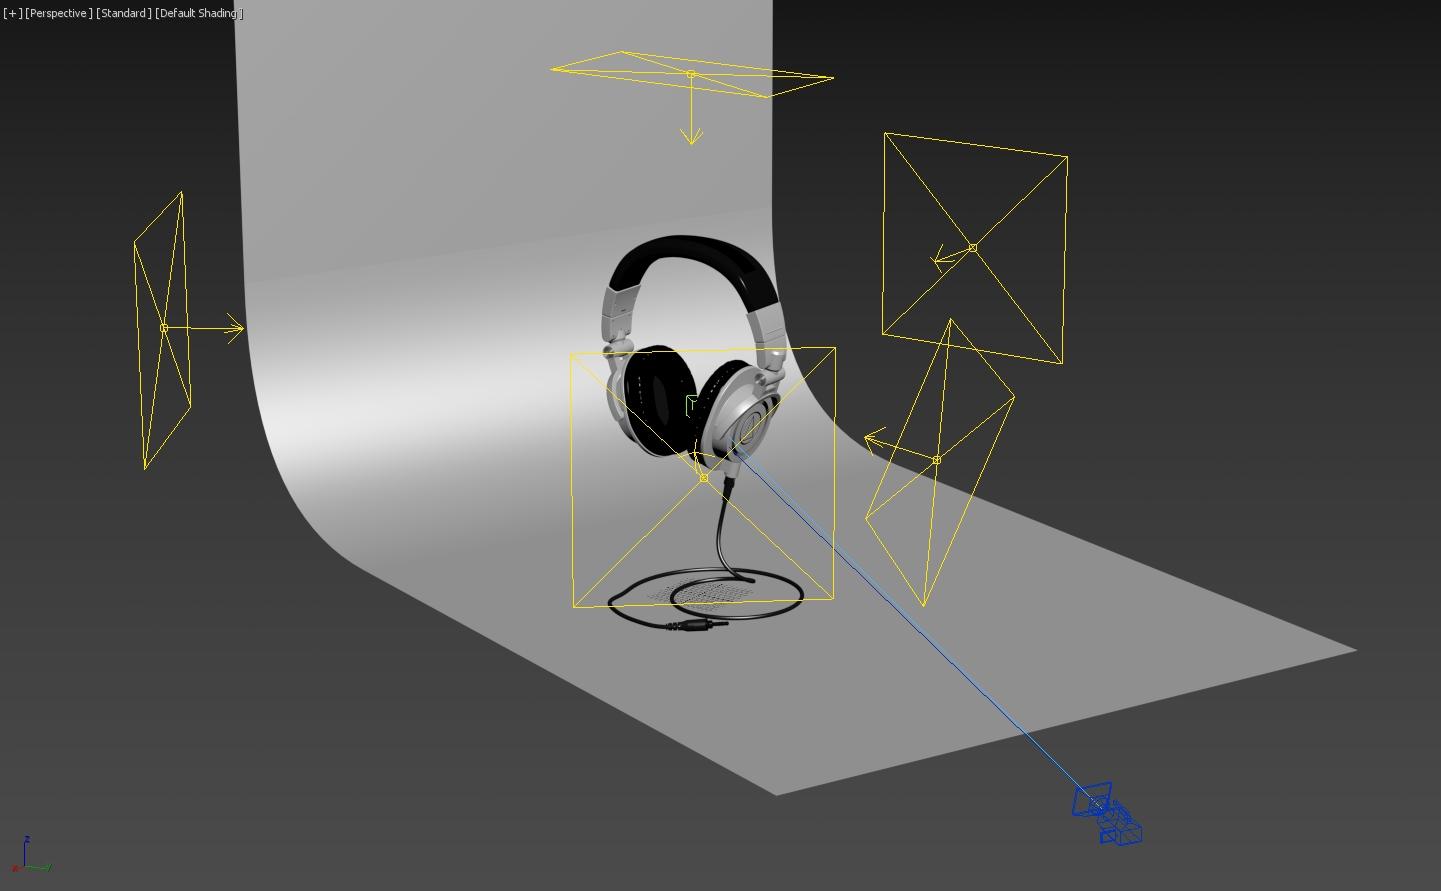 Photoreal Audio-Technica ATH-M50x 3D Model